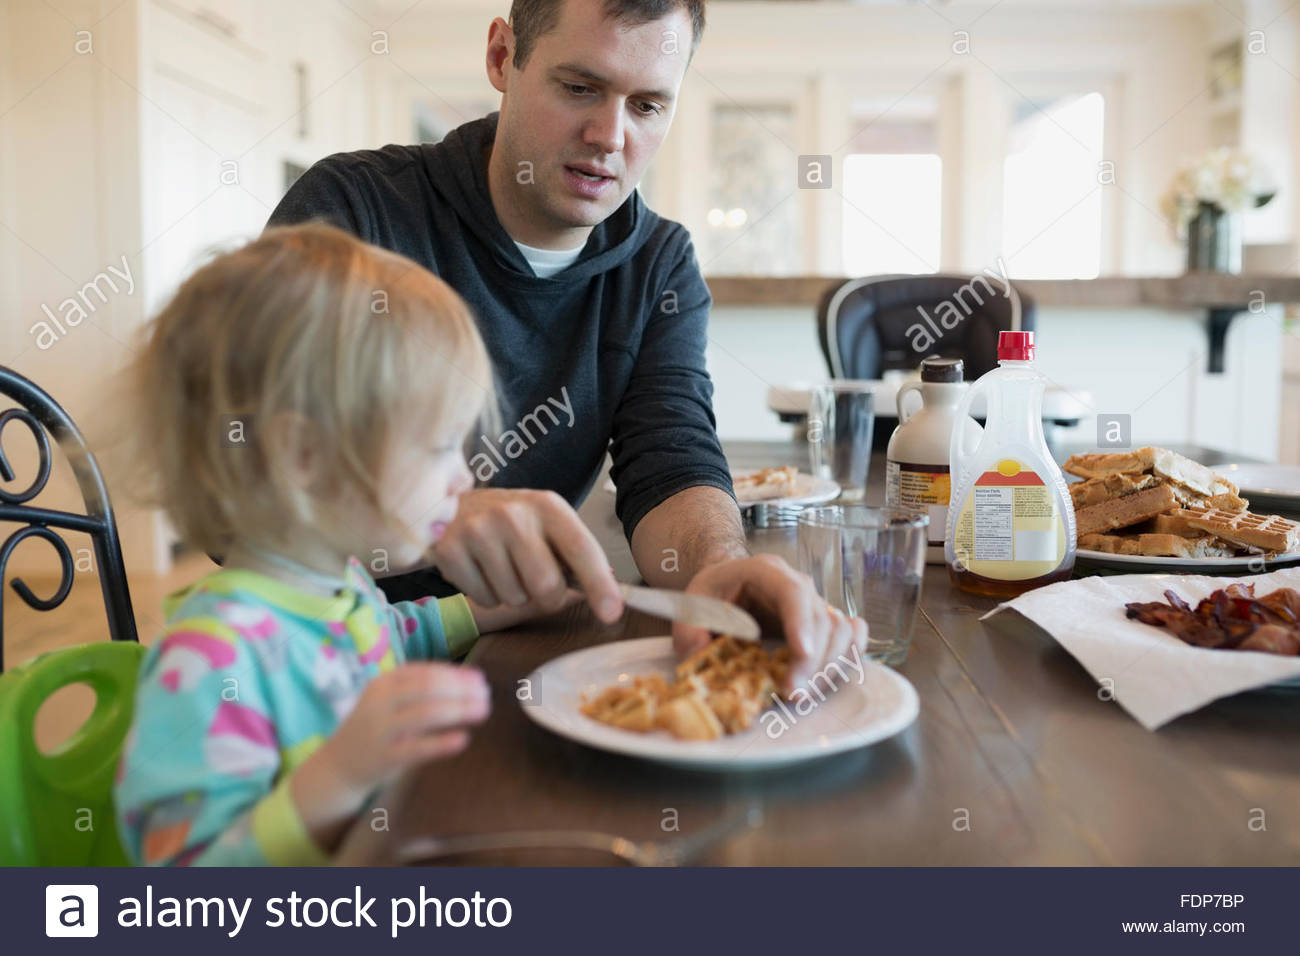 Vater schneiden Waffeln für Tochter am Frühstückstisch Stockbild